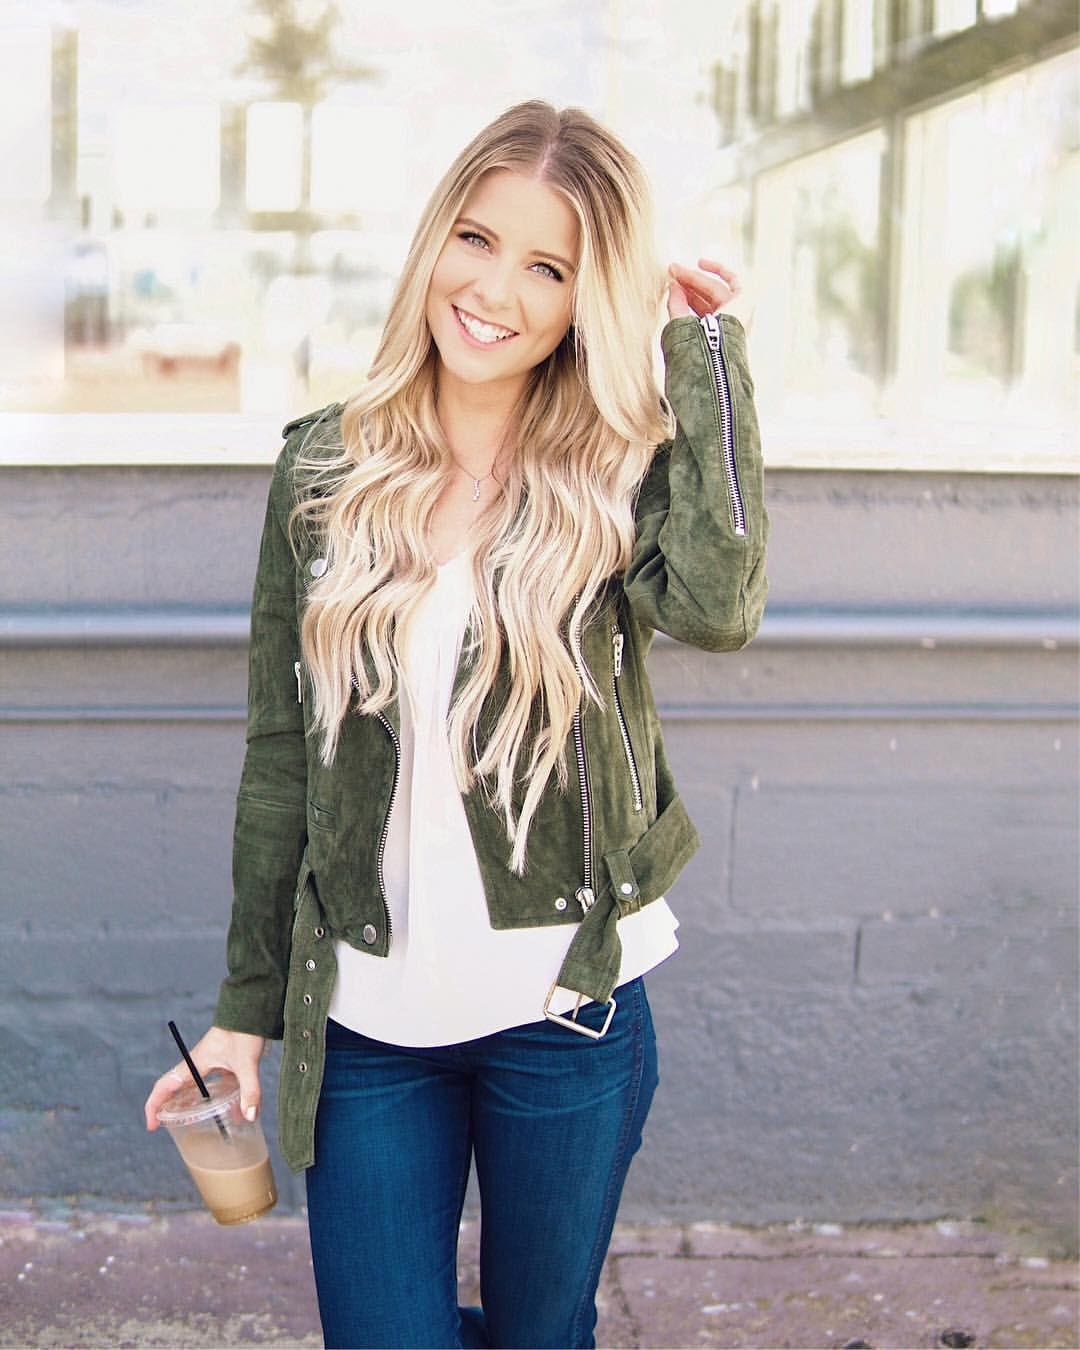 Suede Olive Green Moto Jacket Blanknyc Jacket Fall Fashion Outfit Ideas Heatherpoppie Womens Fashion Jackets Fall Fashion Outfits Moto Jacket Outfit [ 1350 x 1080 Pixel ]